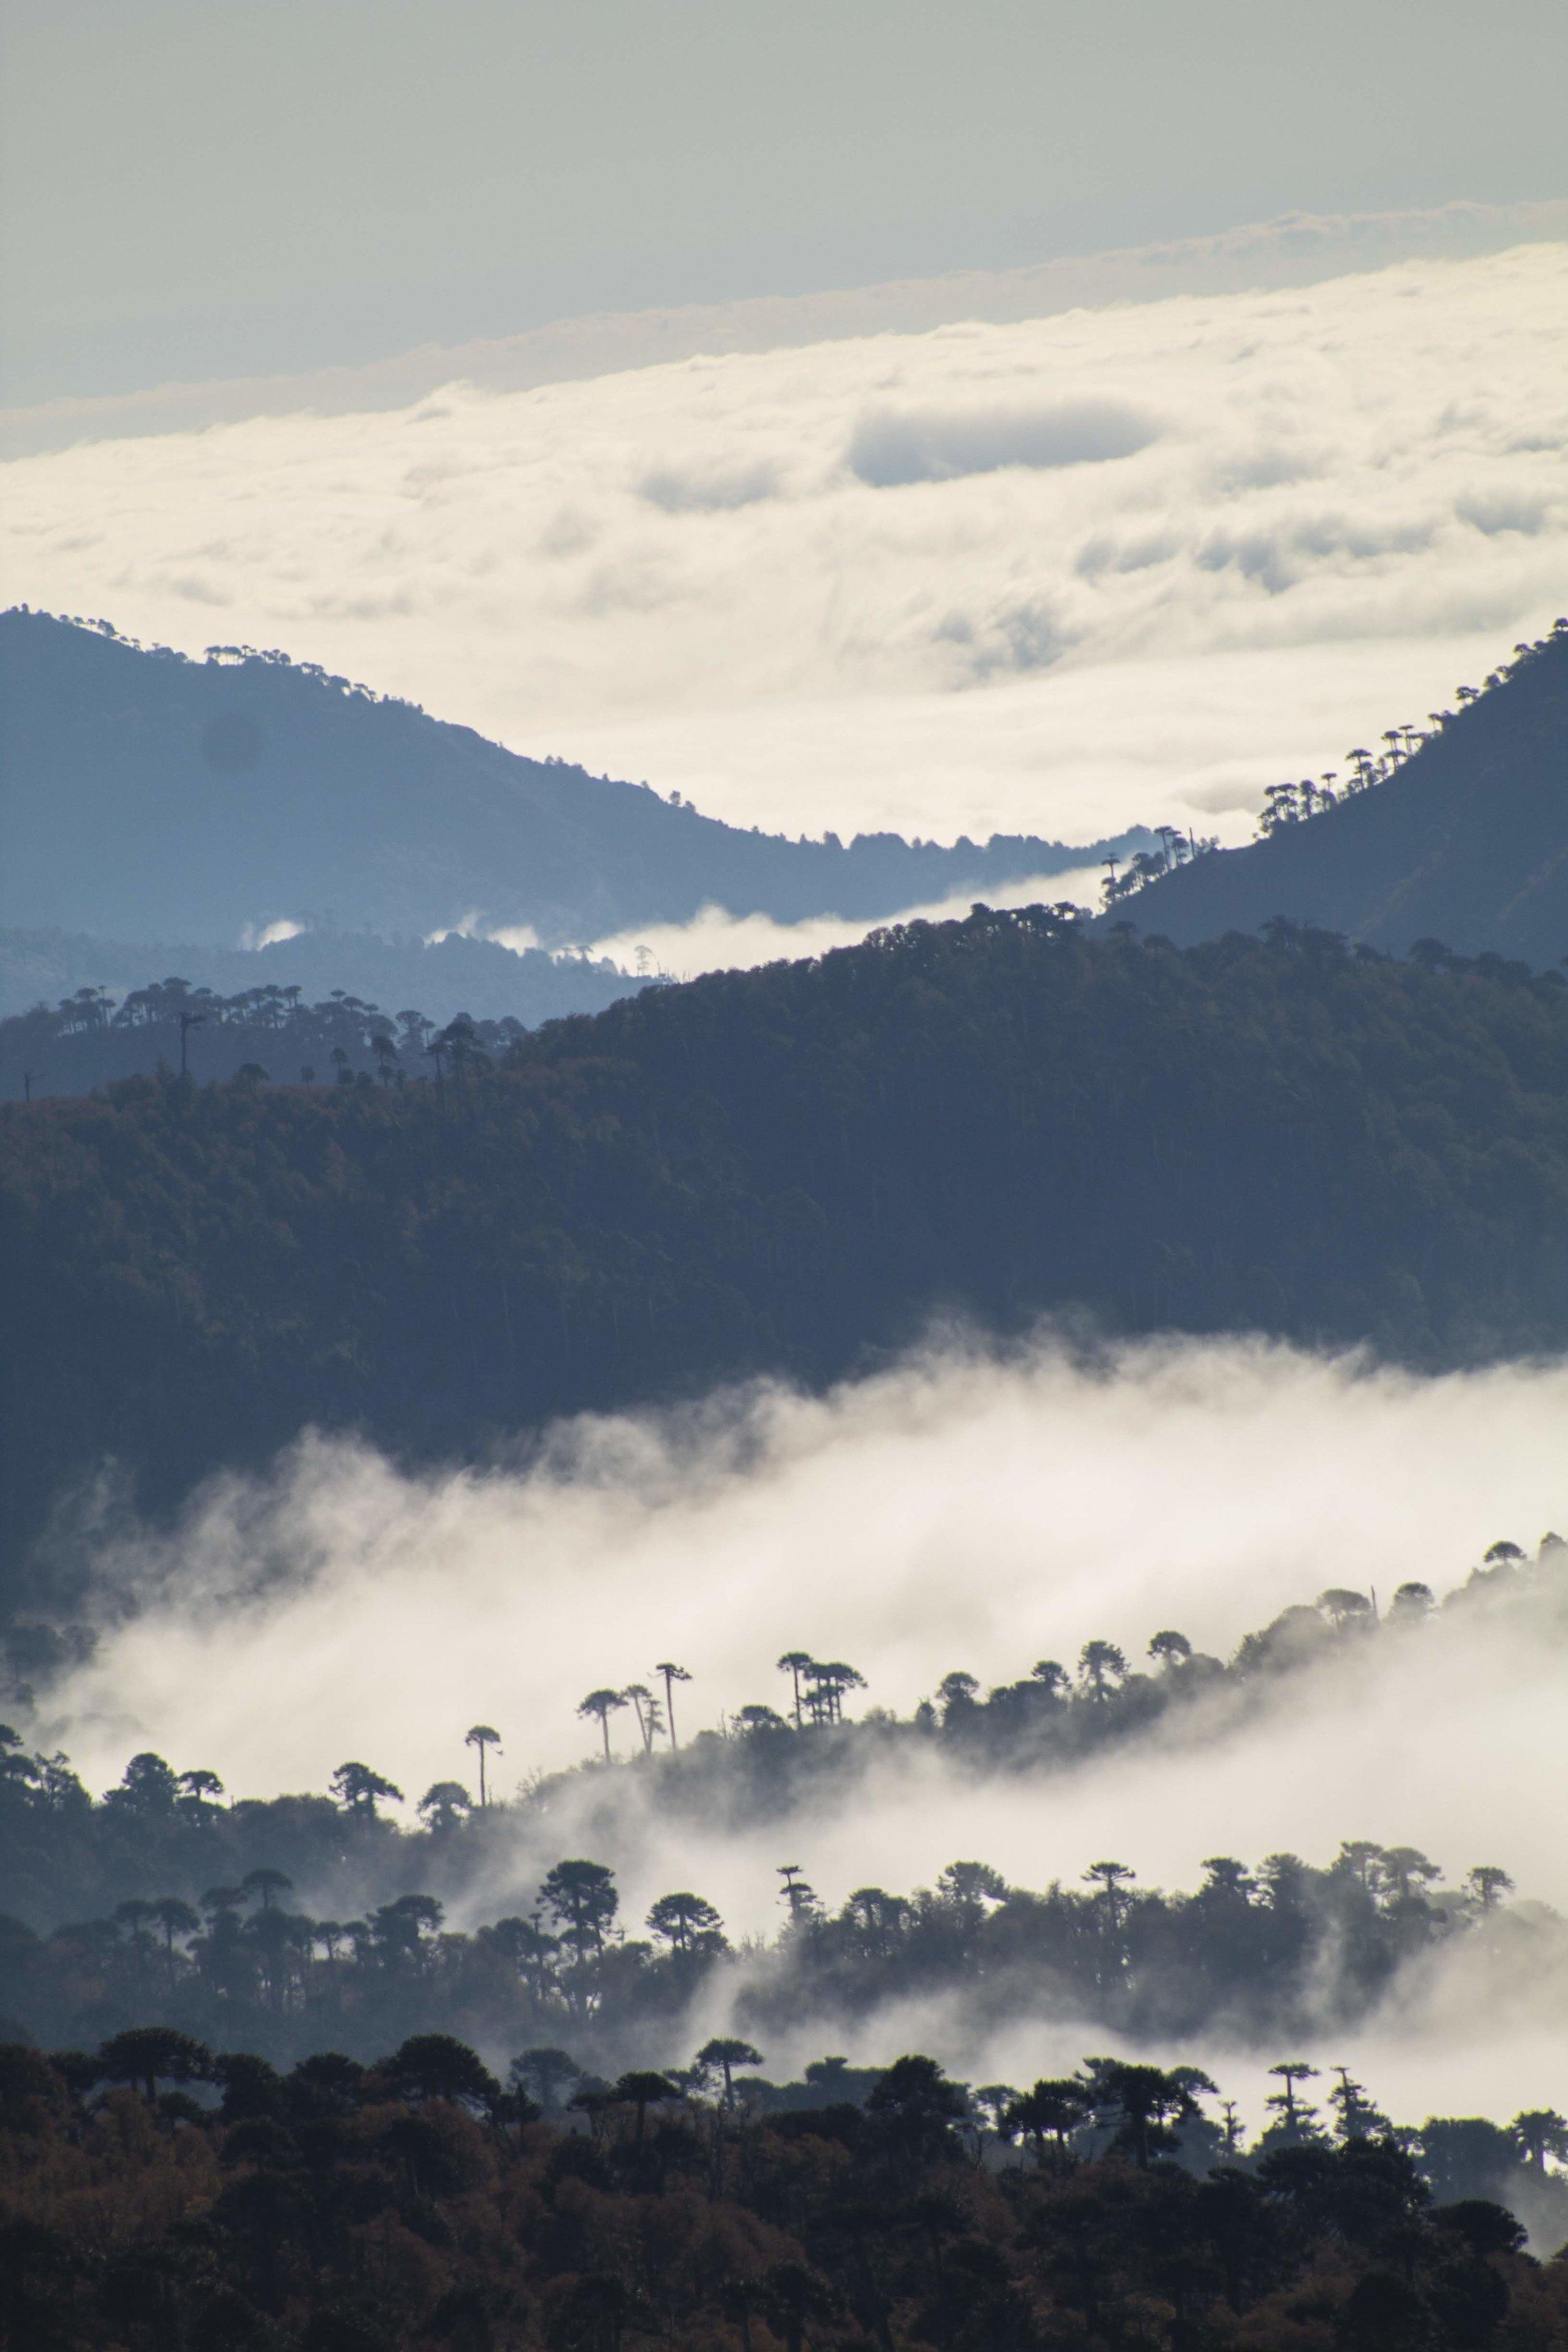 (9) Reserva Nacional Villarrica © Ignacio Castro U. para LOFscapes.